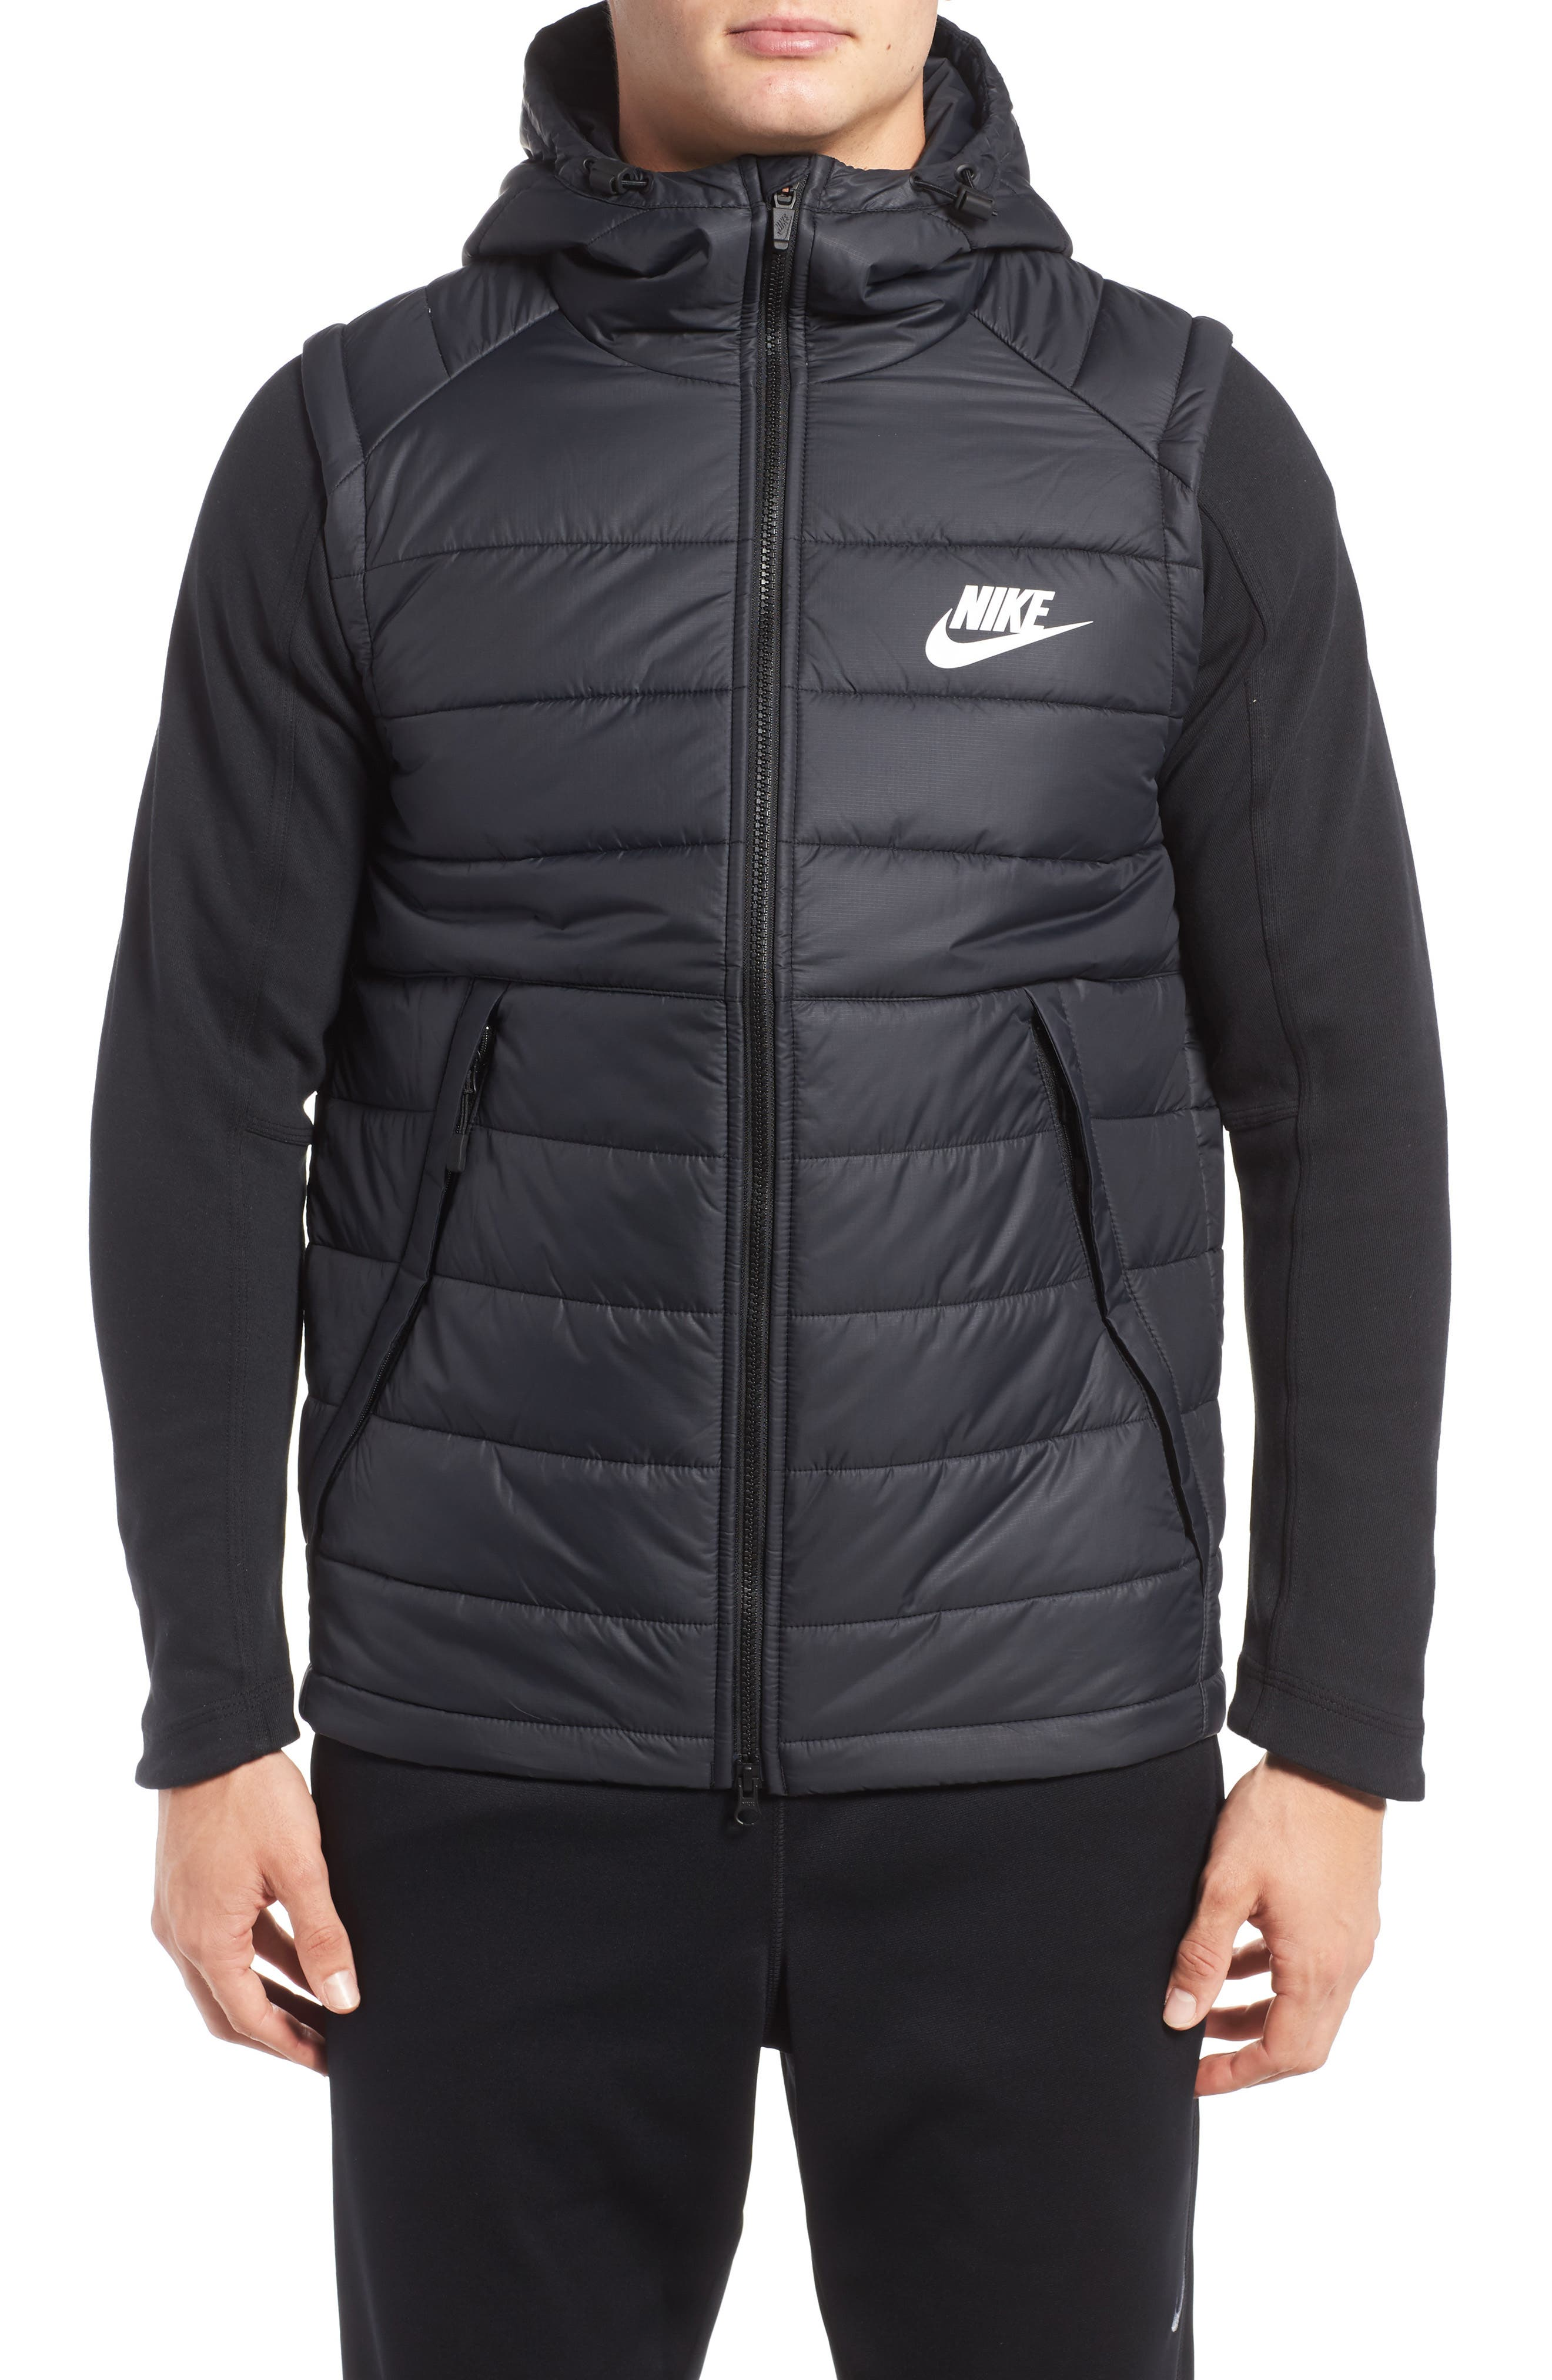 NIKE Sportswear Advance 15 Jacket, Main, color, 010